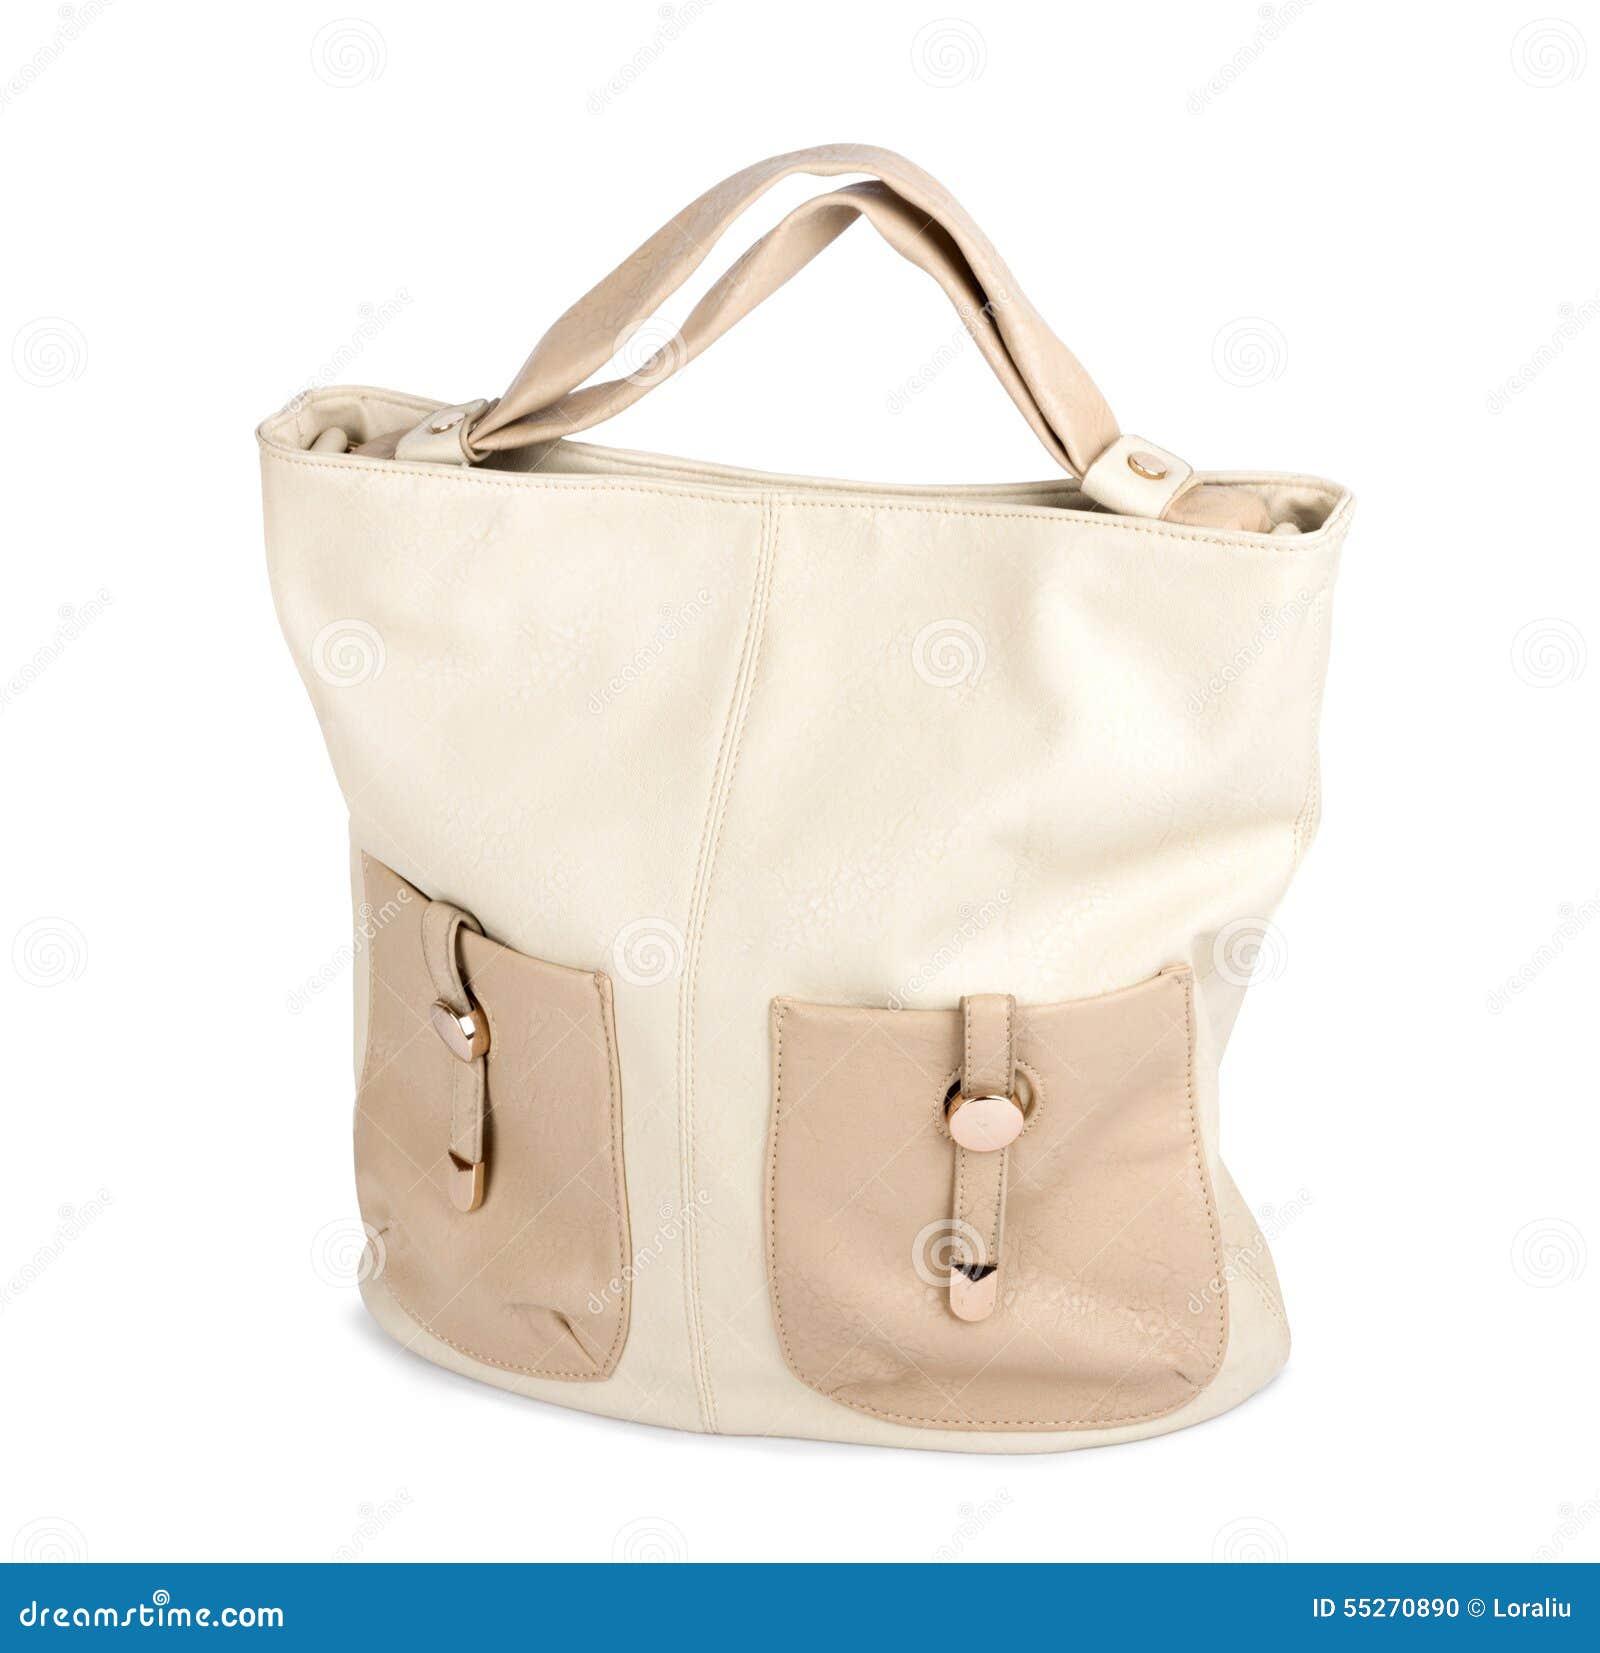 8c6a9f7377 Κομψή γυναικεία μπεζ τσάντα που απομονώνεται Στοκ Εικόνες - εικόνα ...